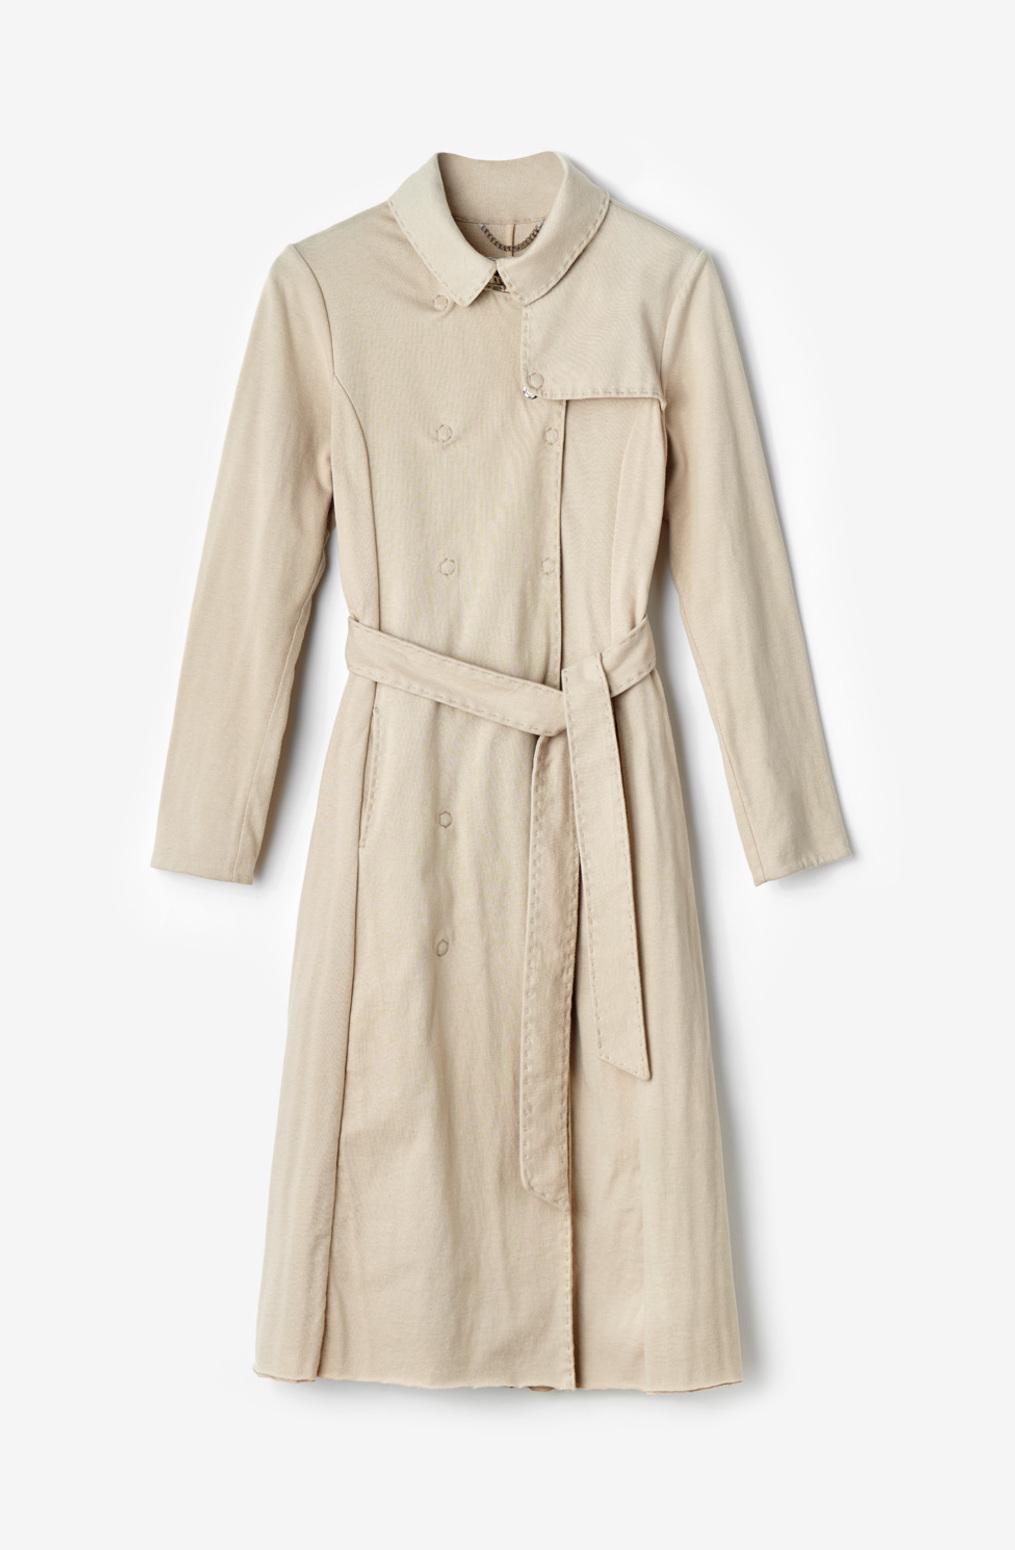 Alabama chanin  organic cotton  womens trench coat  classic  modern  outerwear